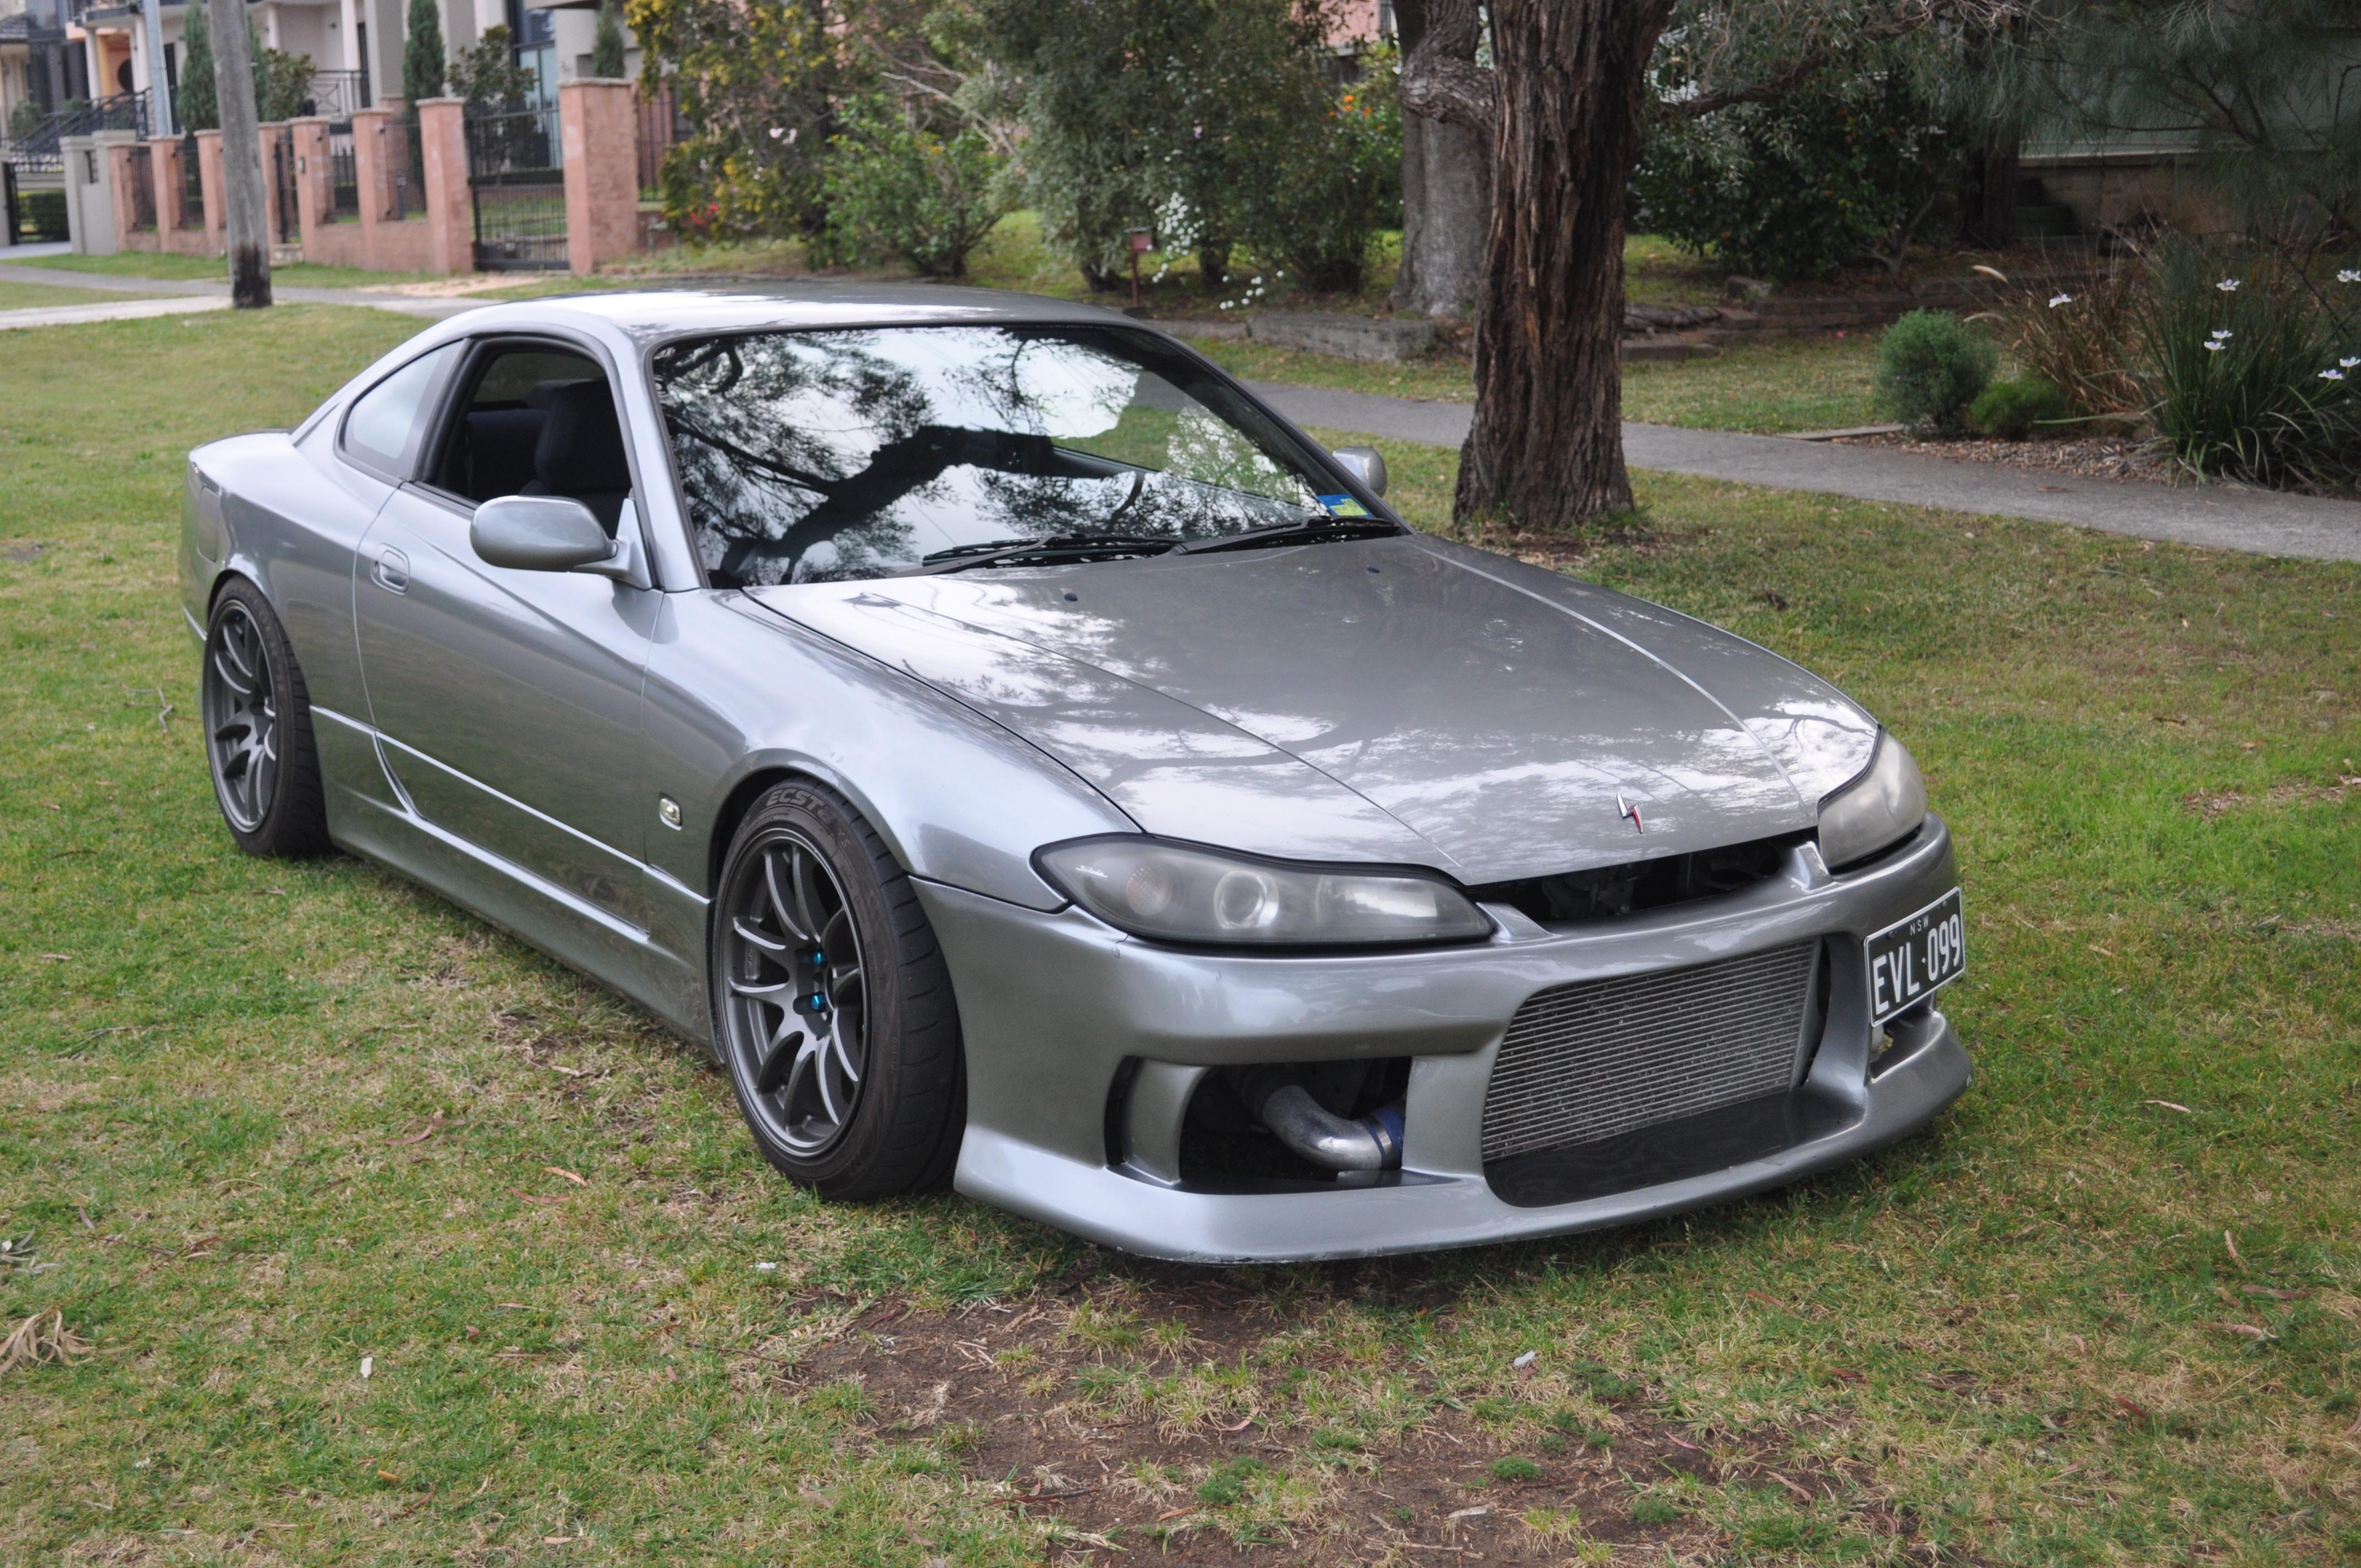 1999 Nissan Silvia S15 Spec R Car Sales Nsw Sydney